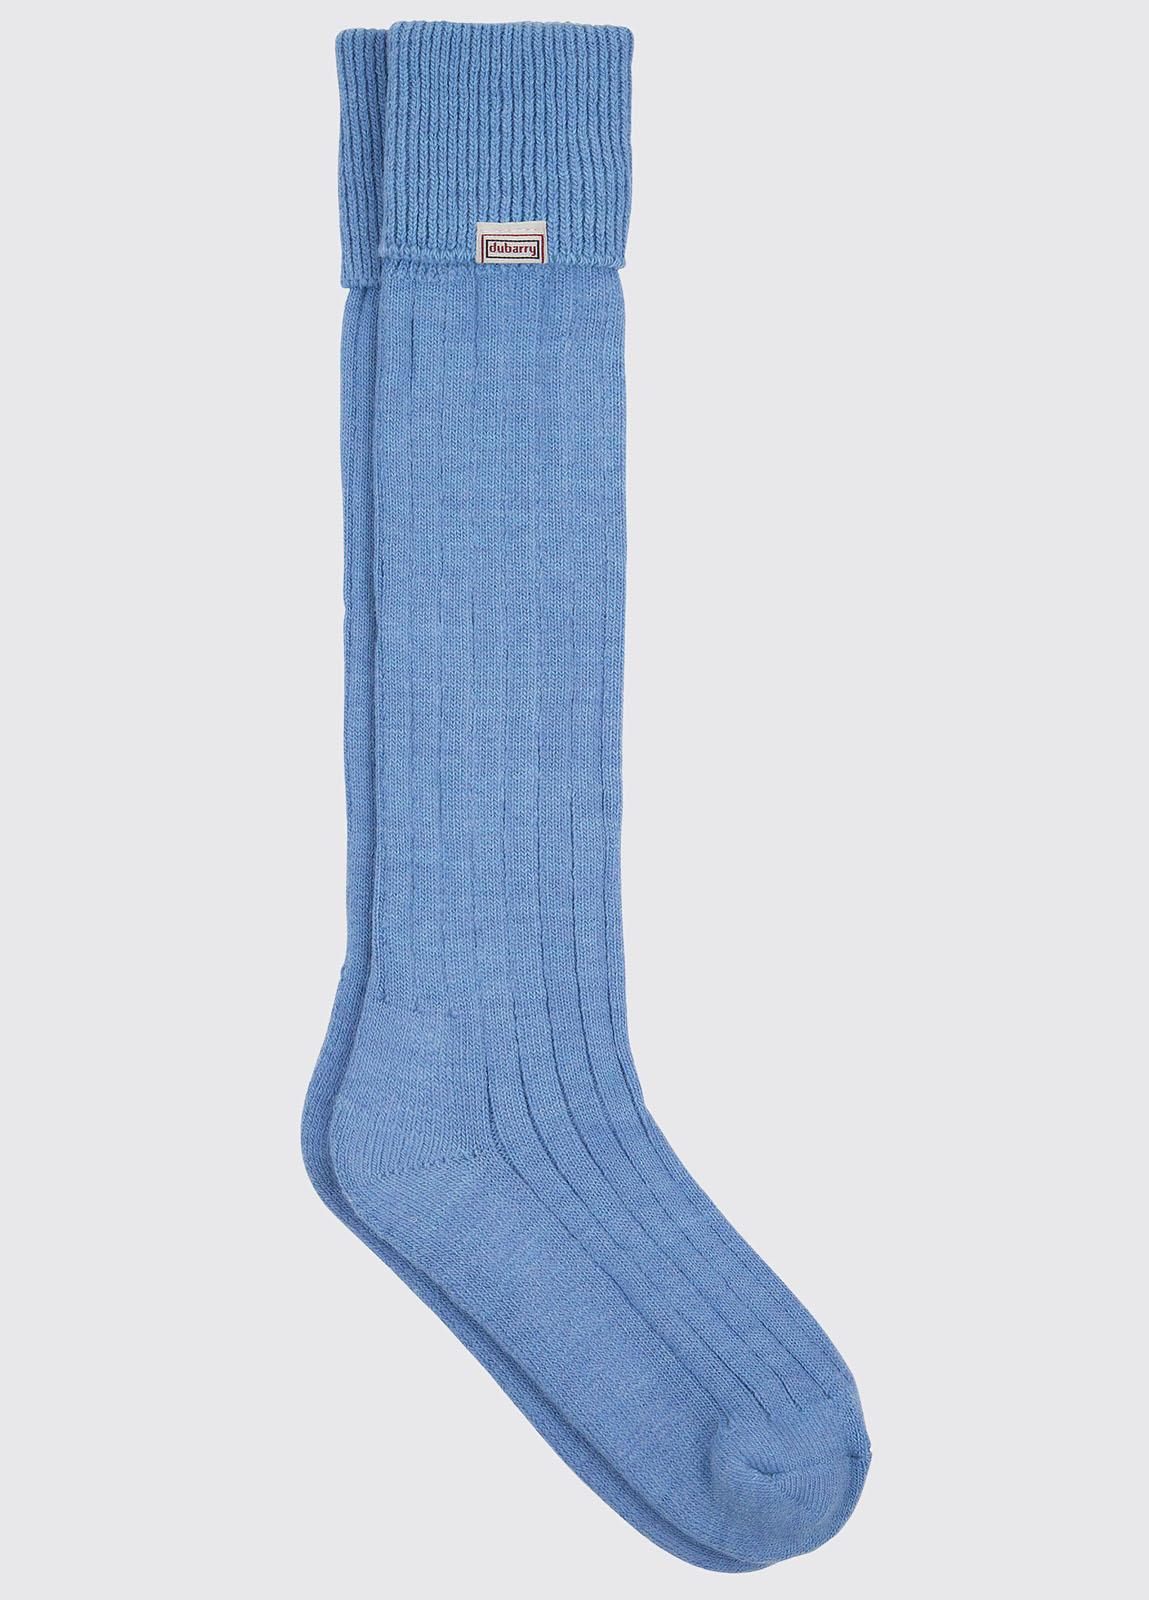 Alpaca Socks - Blue